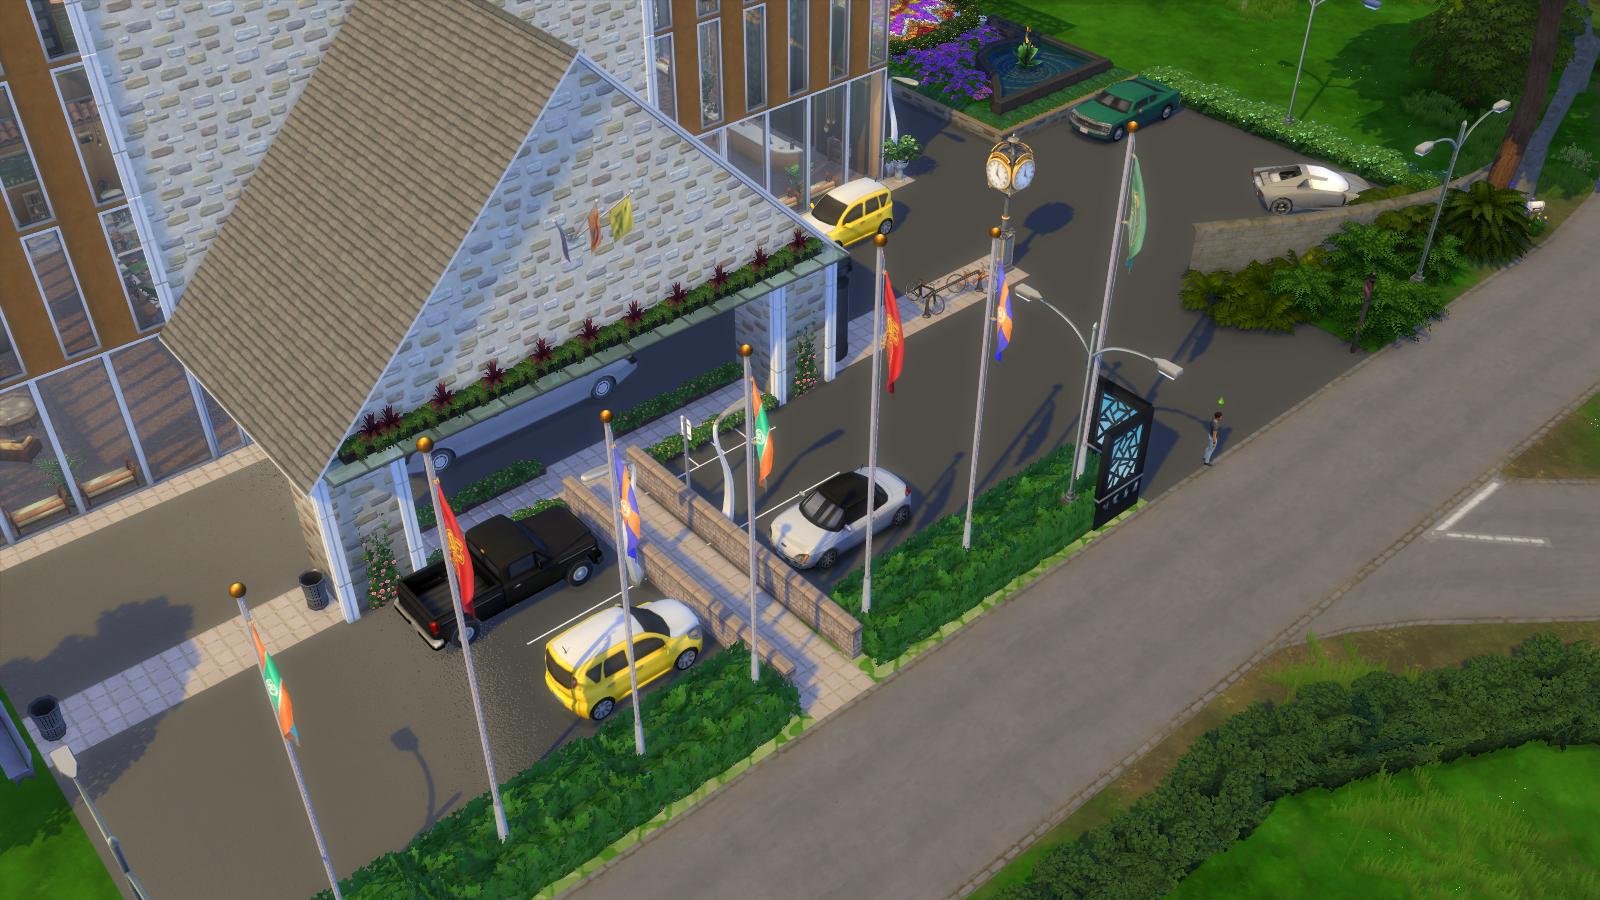 Embassy Suites Sims 4 no CC